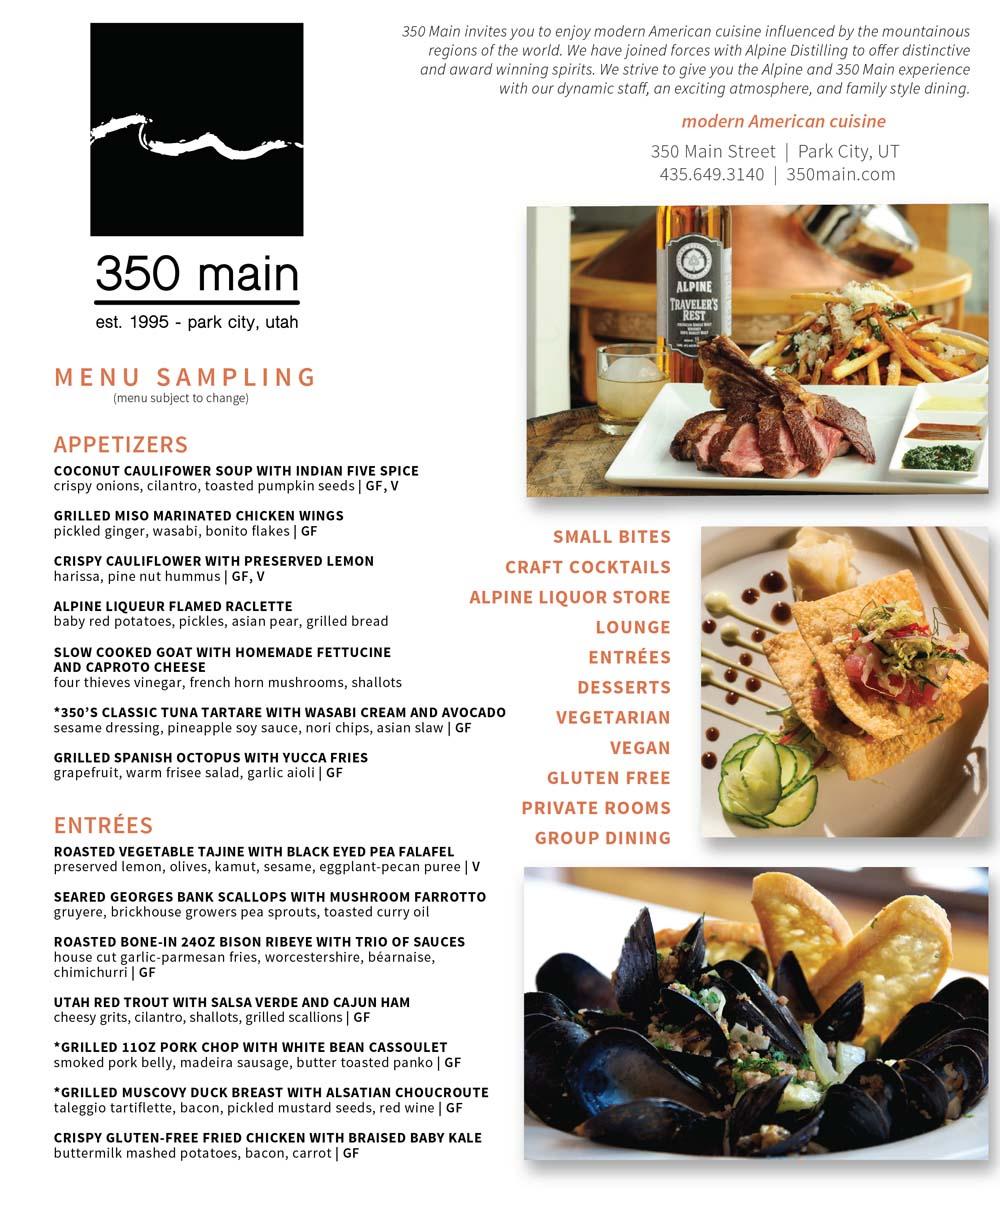 350 Main Brasserie – Main Street Park City